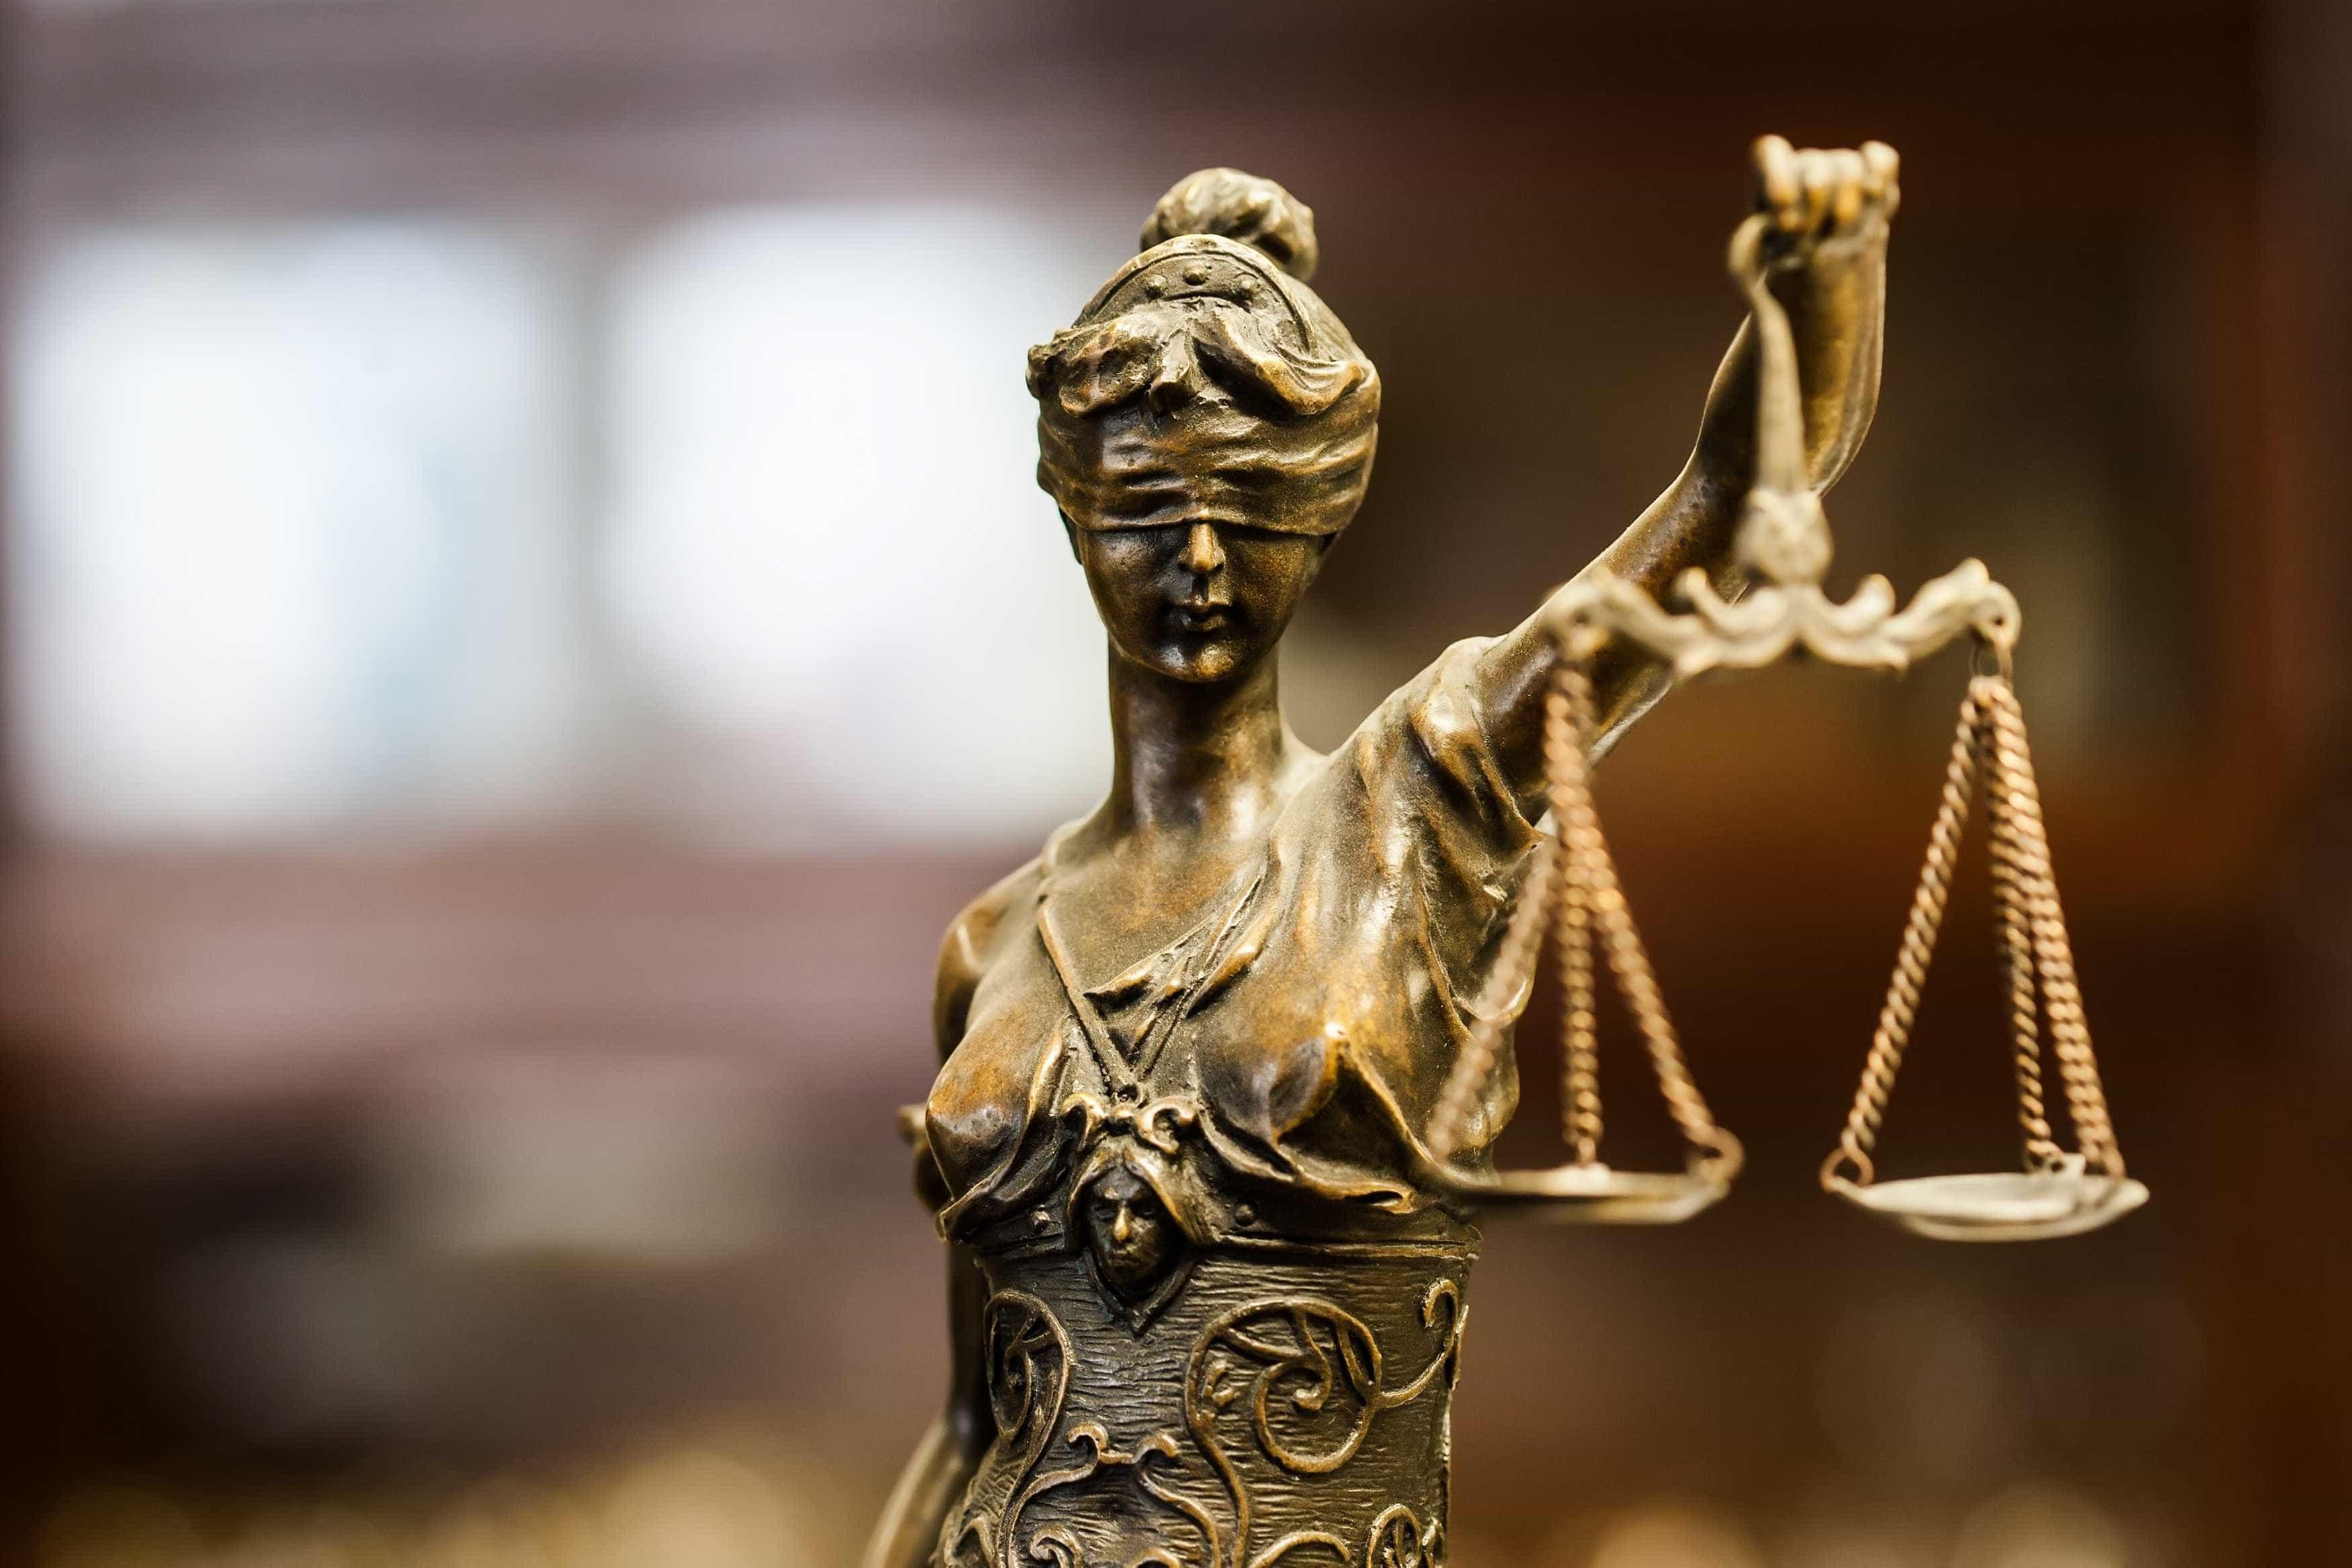 Ex-tesoureira de faculdade acusada de desviar verbas e simular roubo